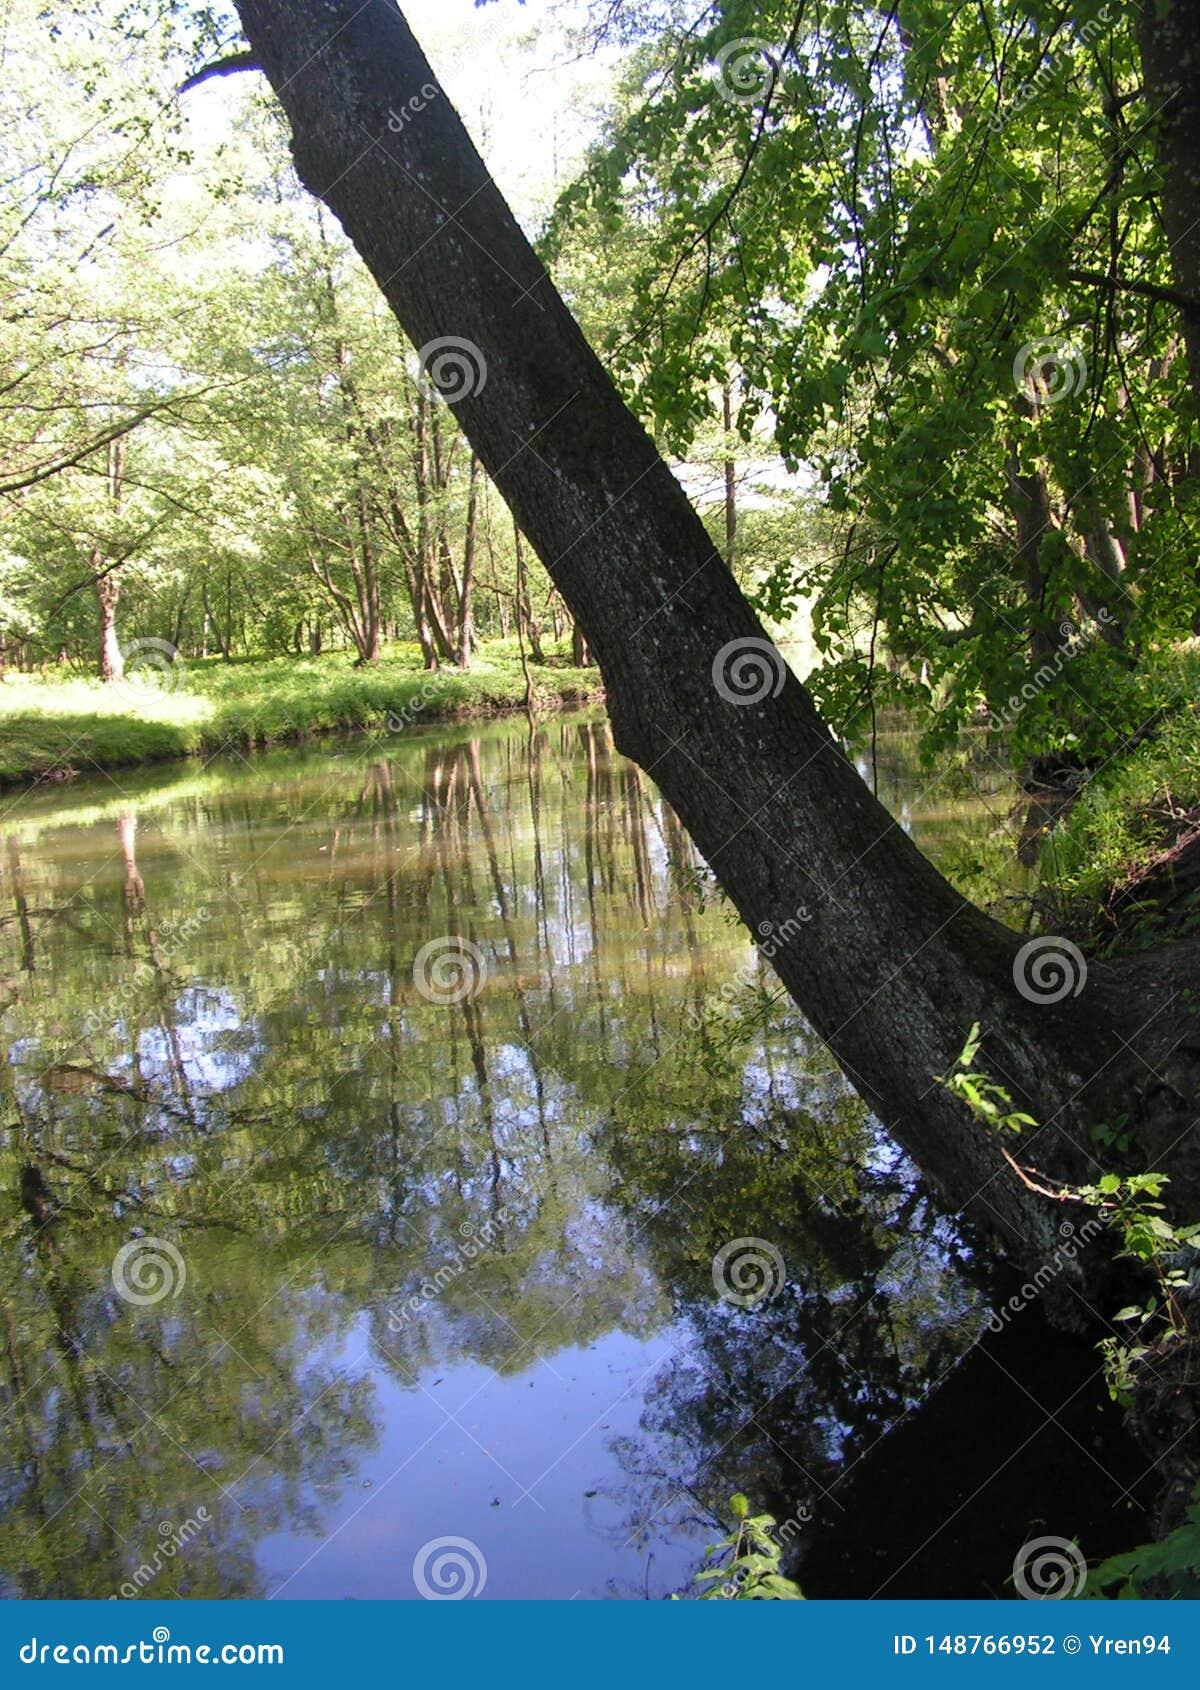 11 Forest Park ?DROZDY ?in Minsk Wei?russland